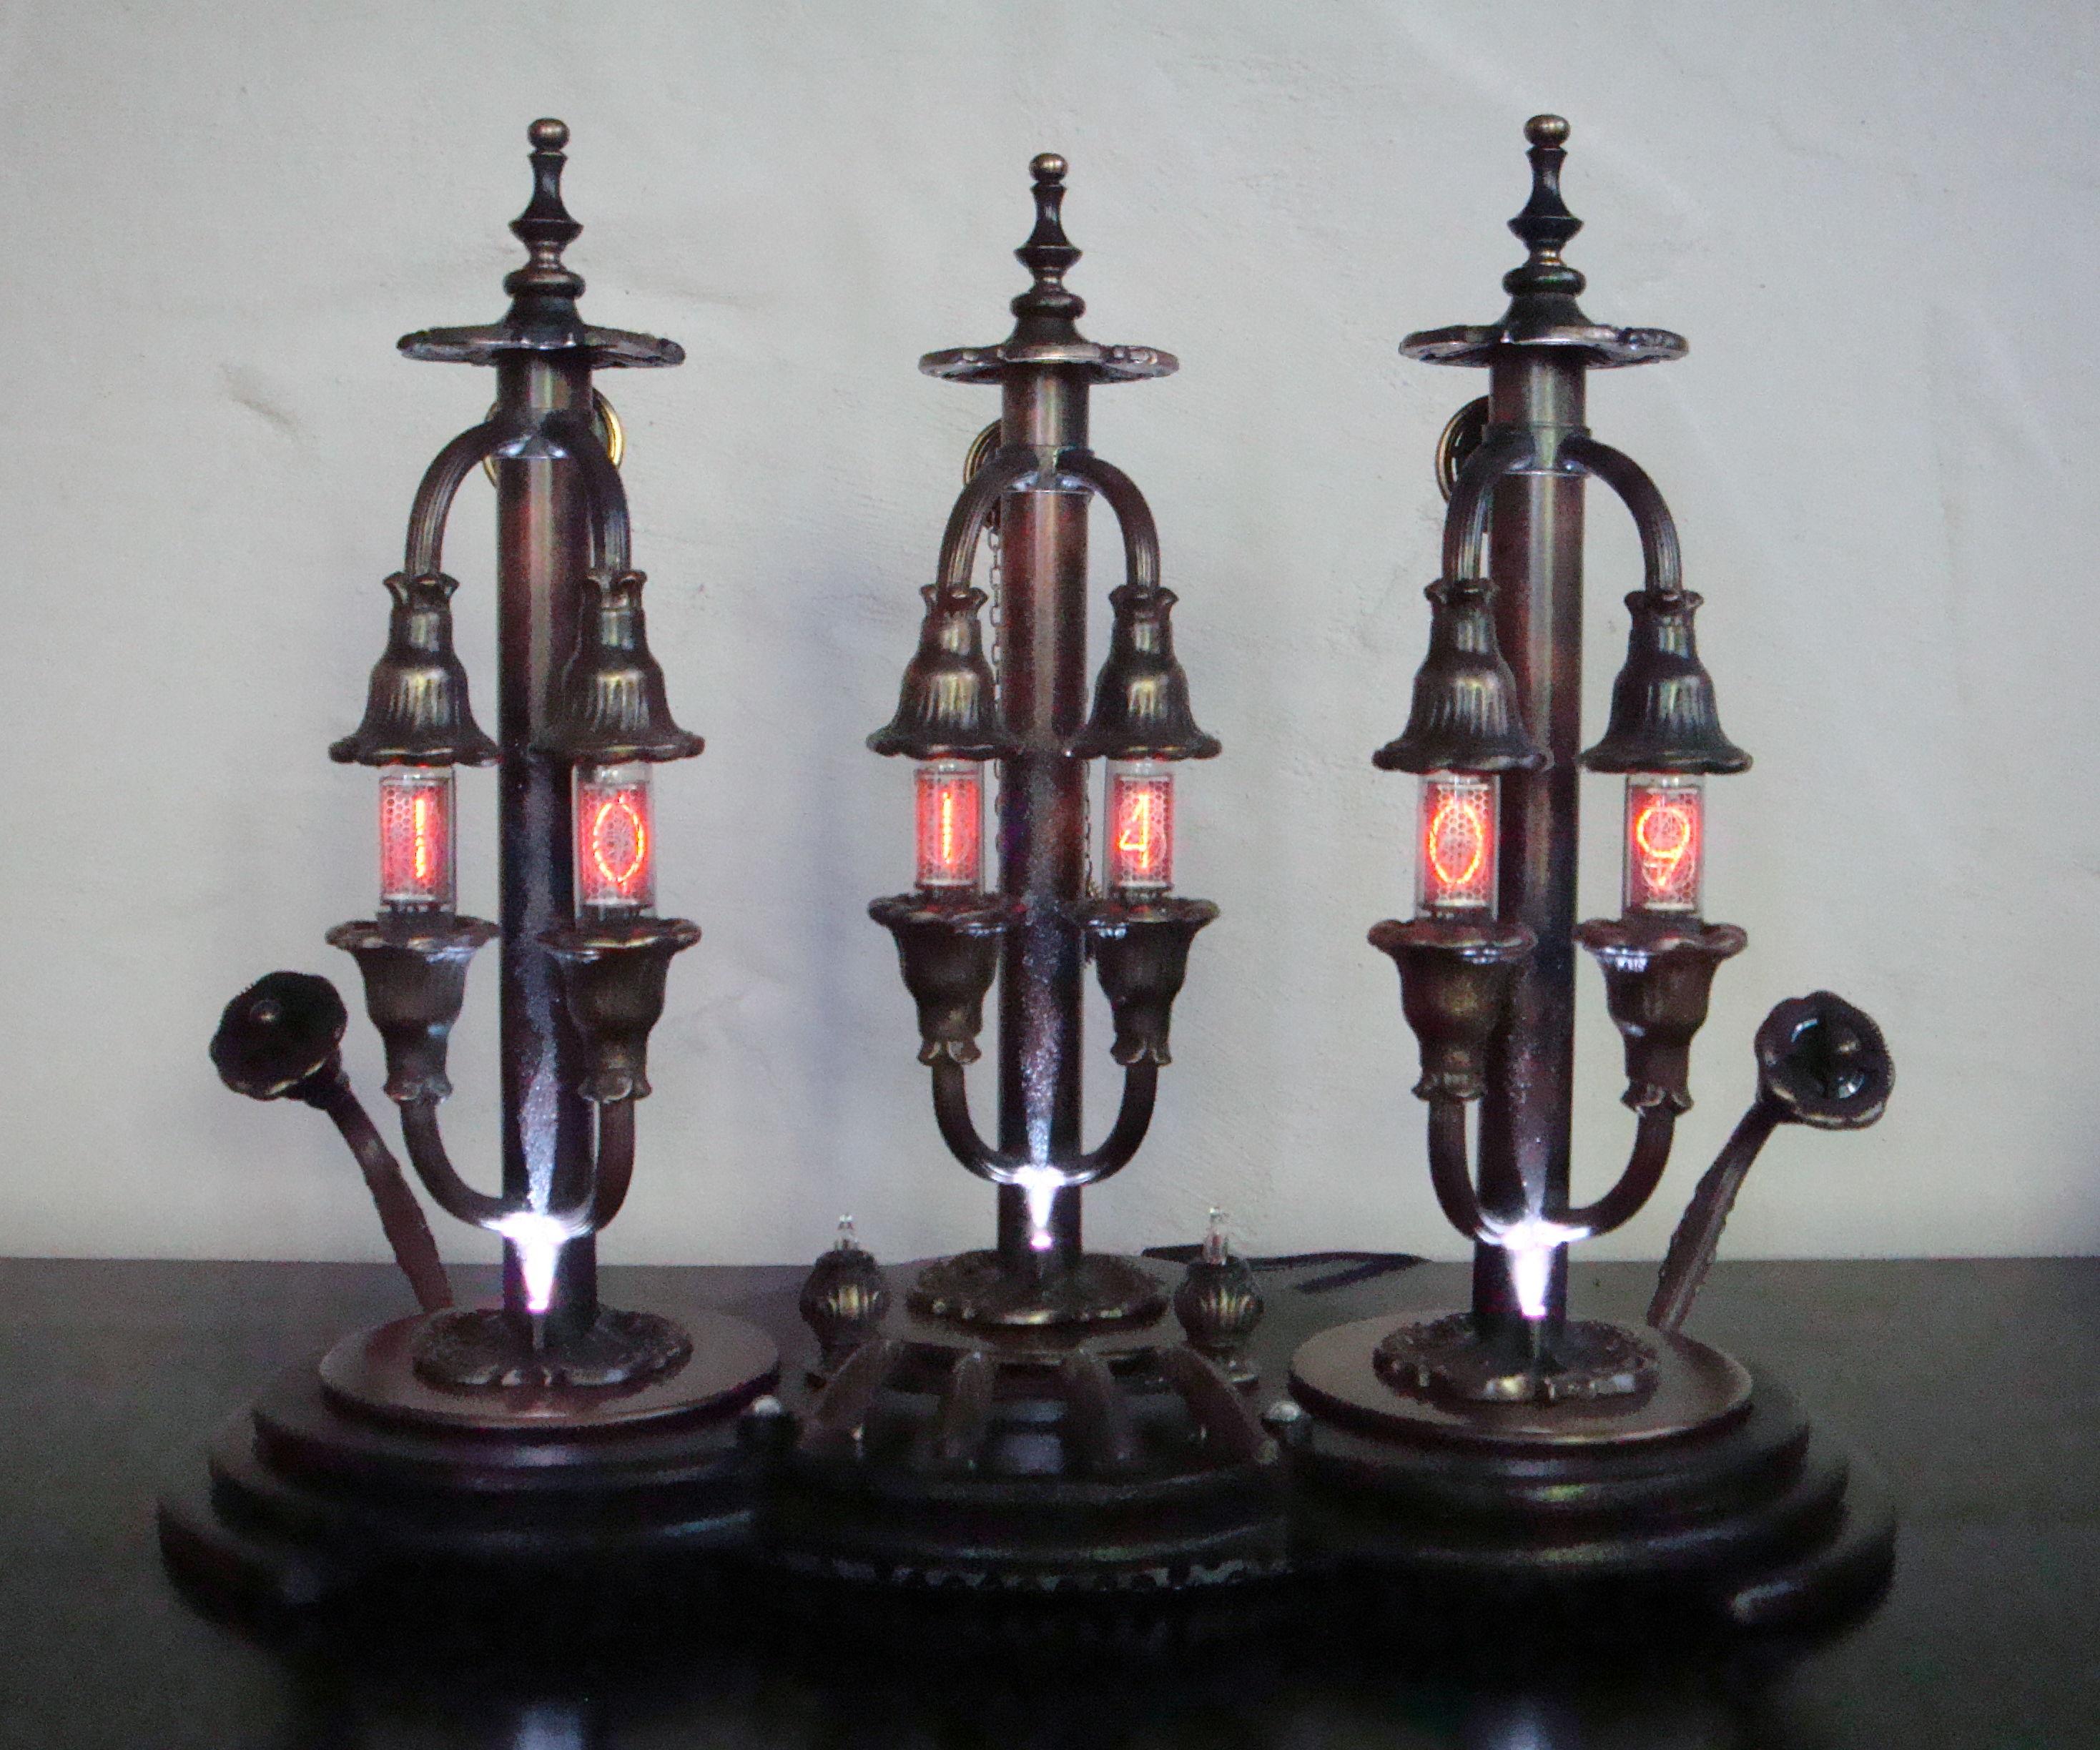 The Pillars of Time - A Steampunk Nixie Clock